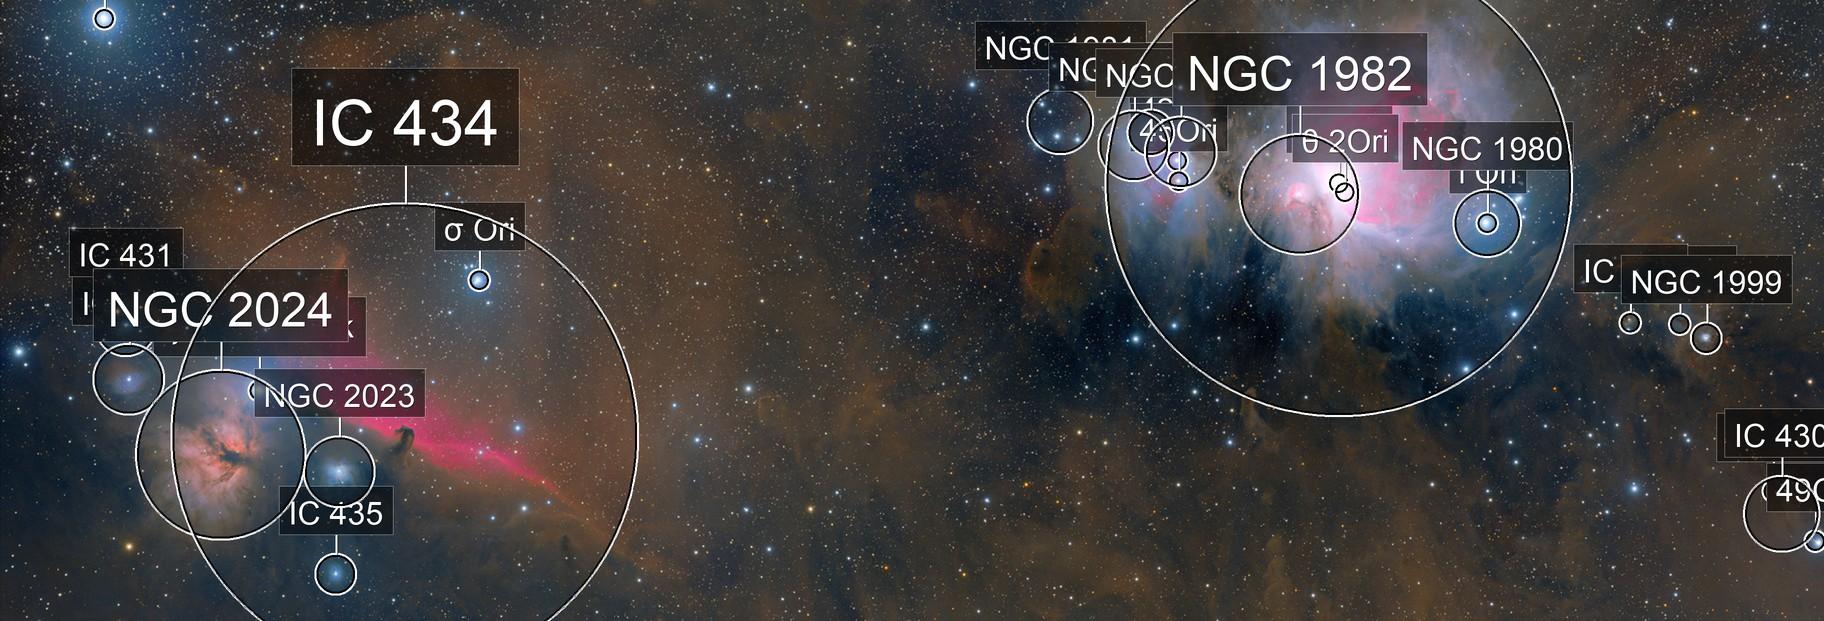 Horsehead Nebula and M42 - Two Panel Mosaic (HaRGB)